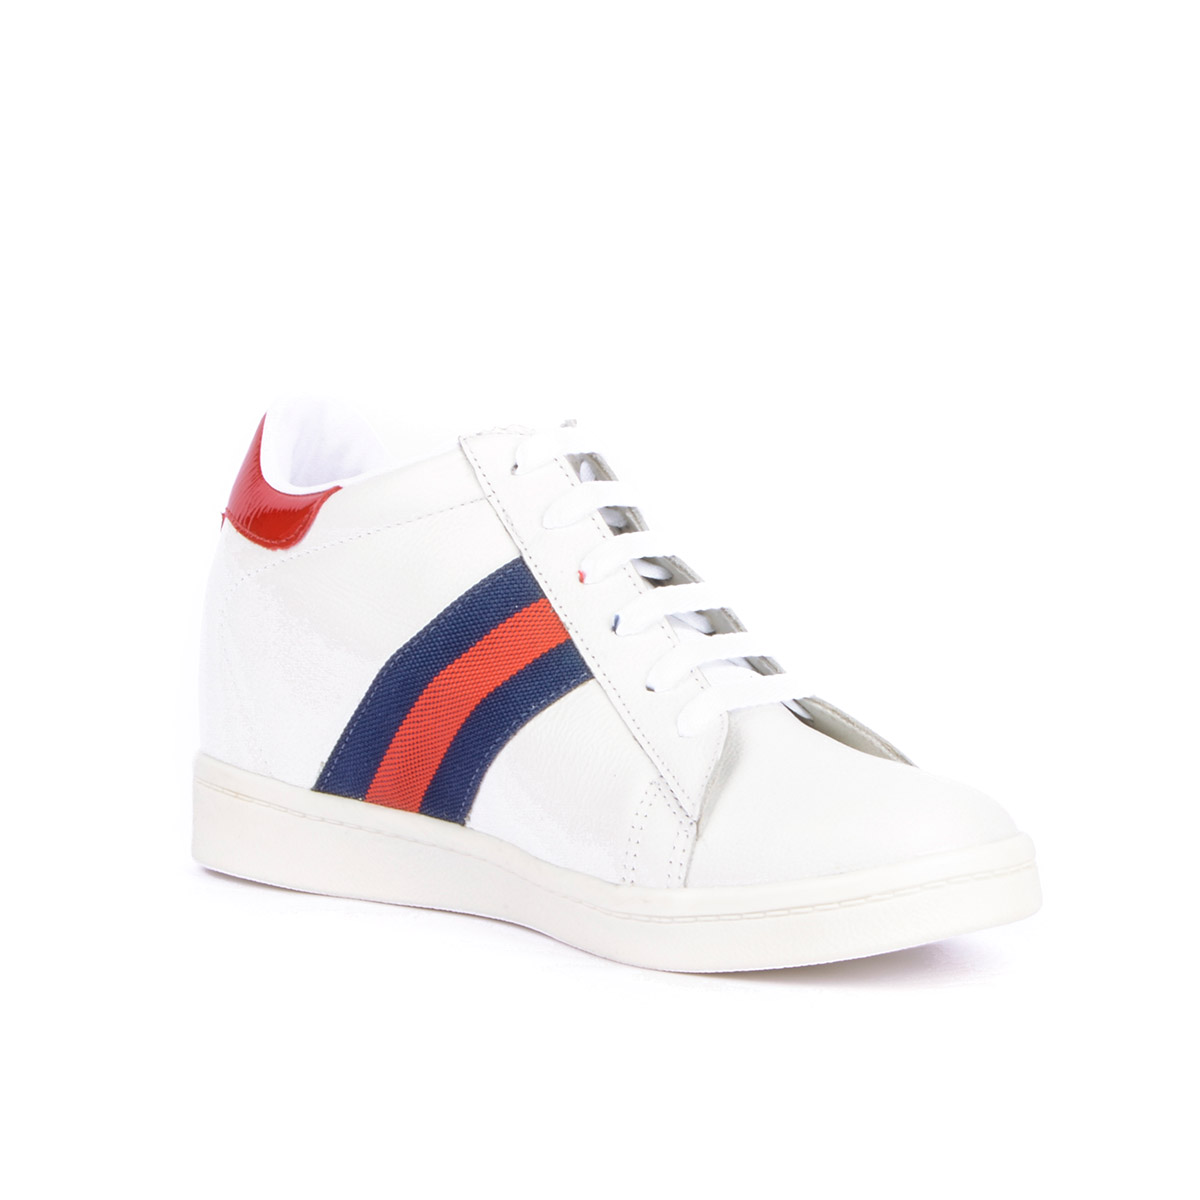 Tenis Casual Wild Blanco Max Denegri +7cms de Altura_75939